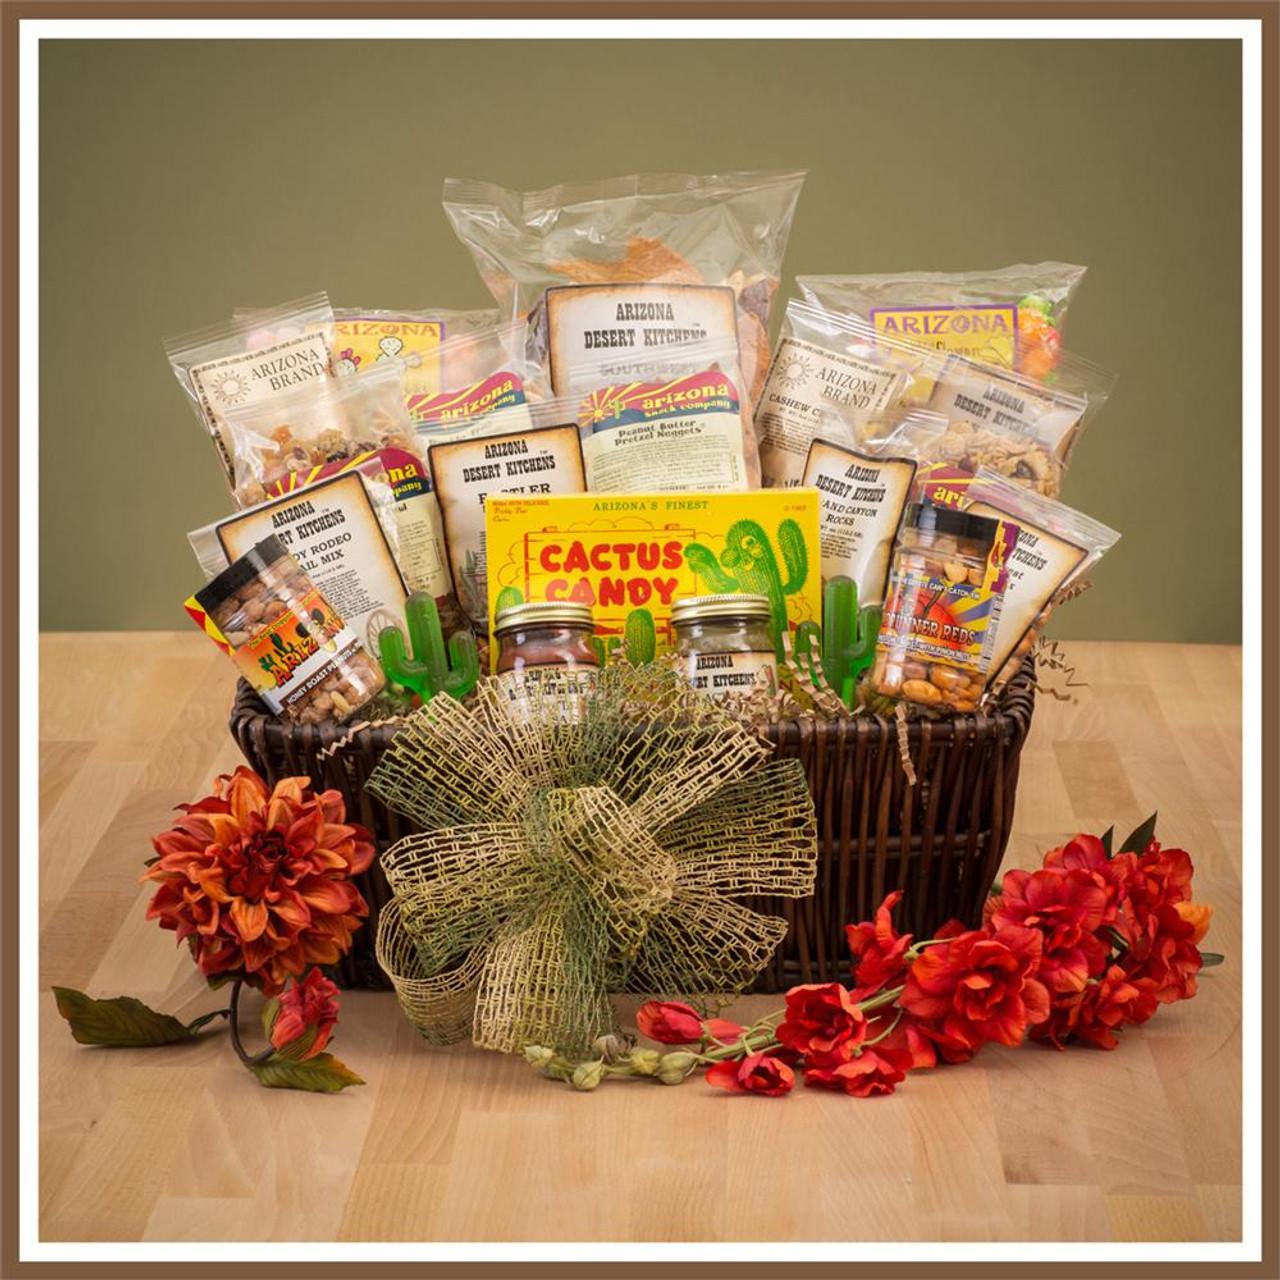 arizona southwest snacks gift basket, trail mix, nuts